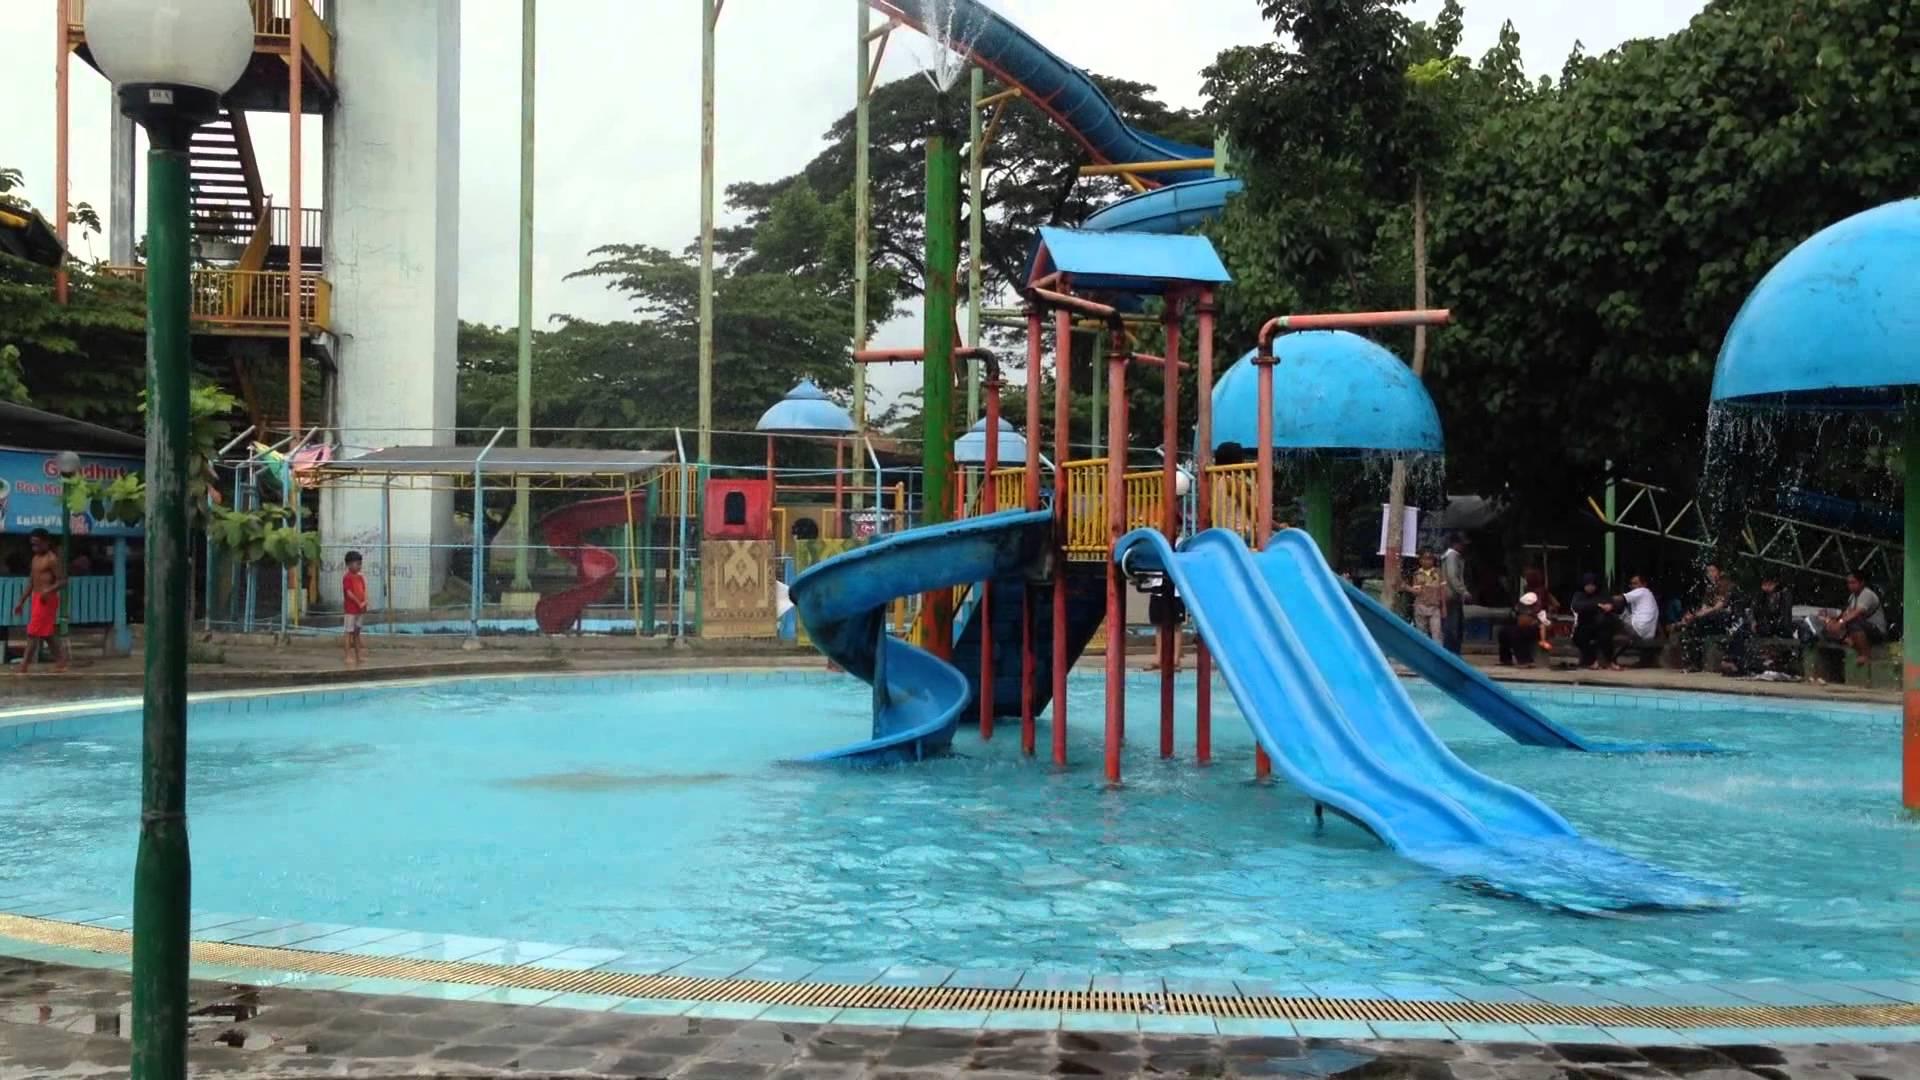 Wisata Waterboom Cokrotulung Air Janti Seru Asik Tiket Murah Youtube